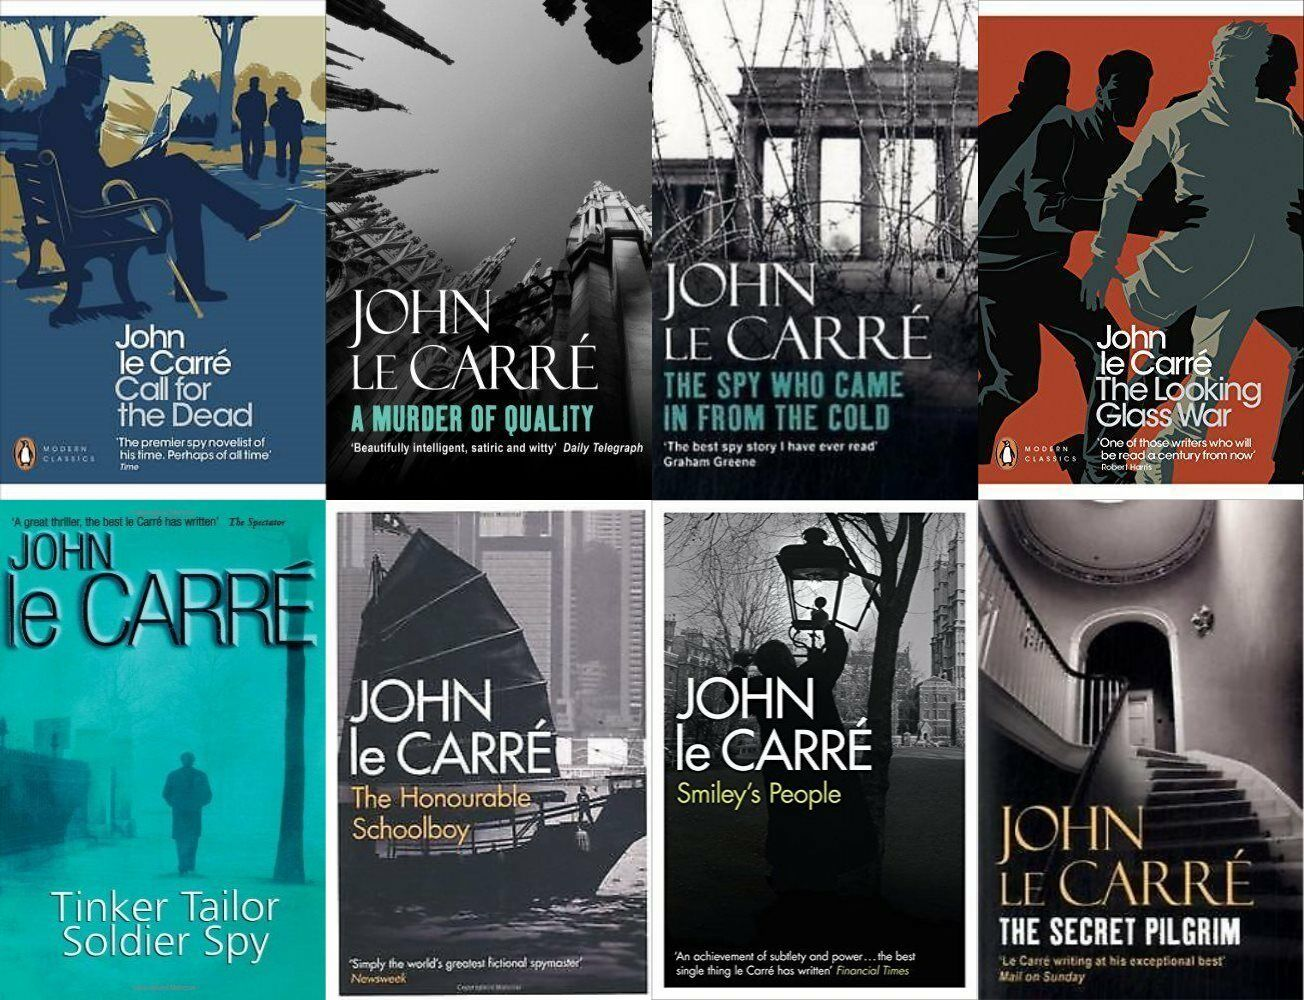 John le Carre Collection - John le Carre